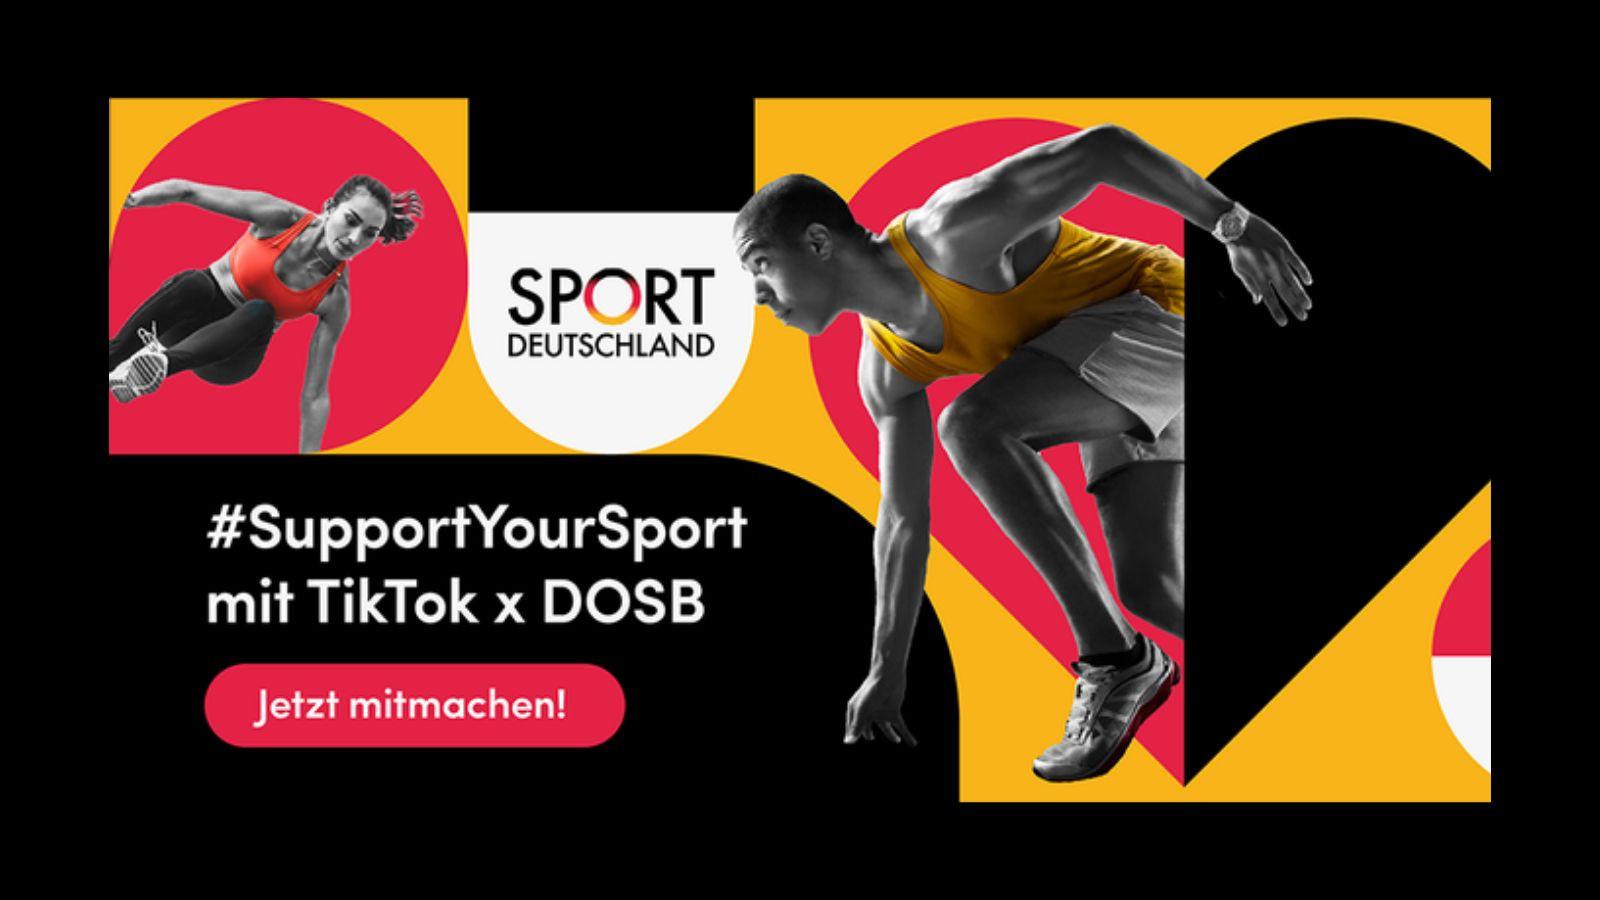 A DOSB and TikTok campaign has raised €100,000 ©DOSB